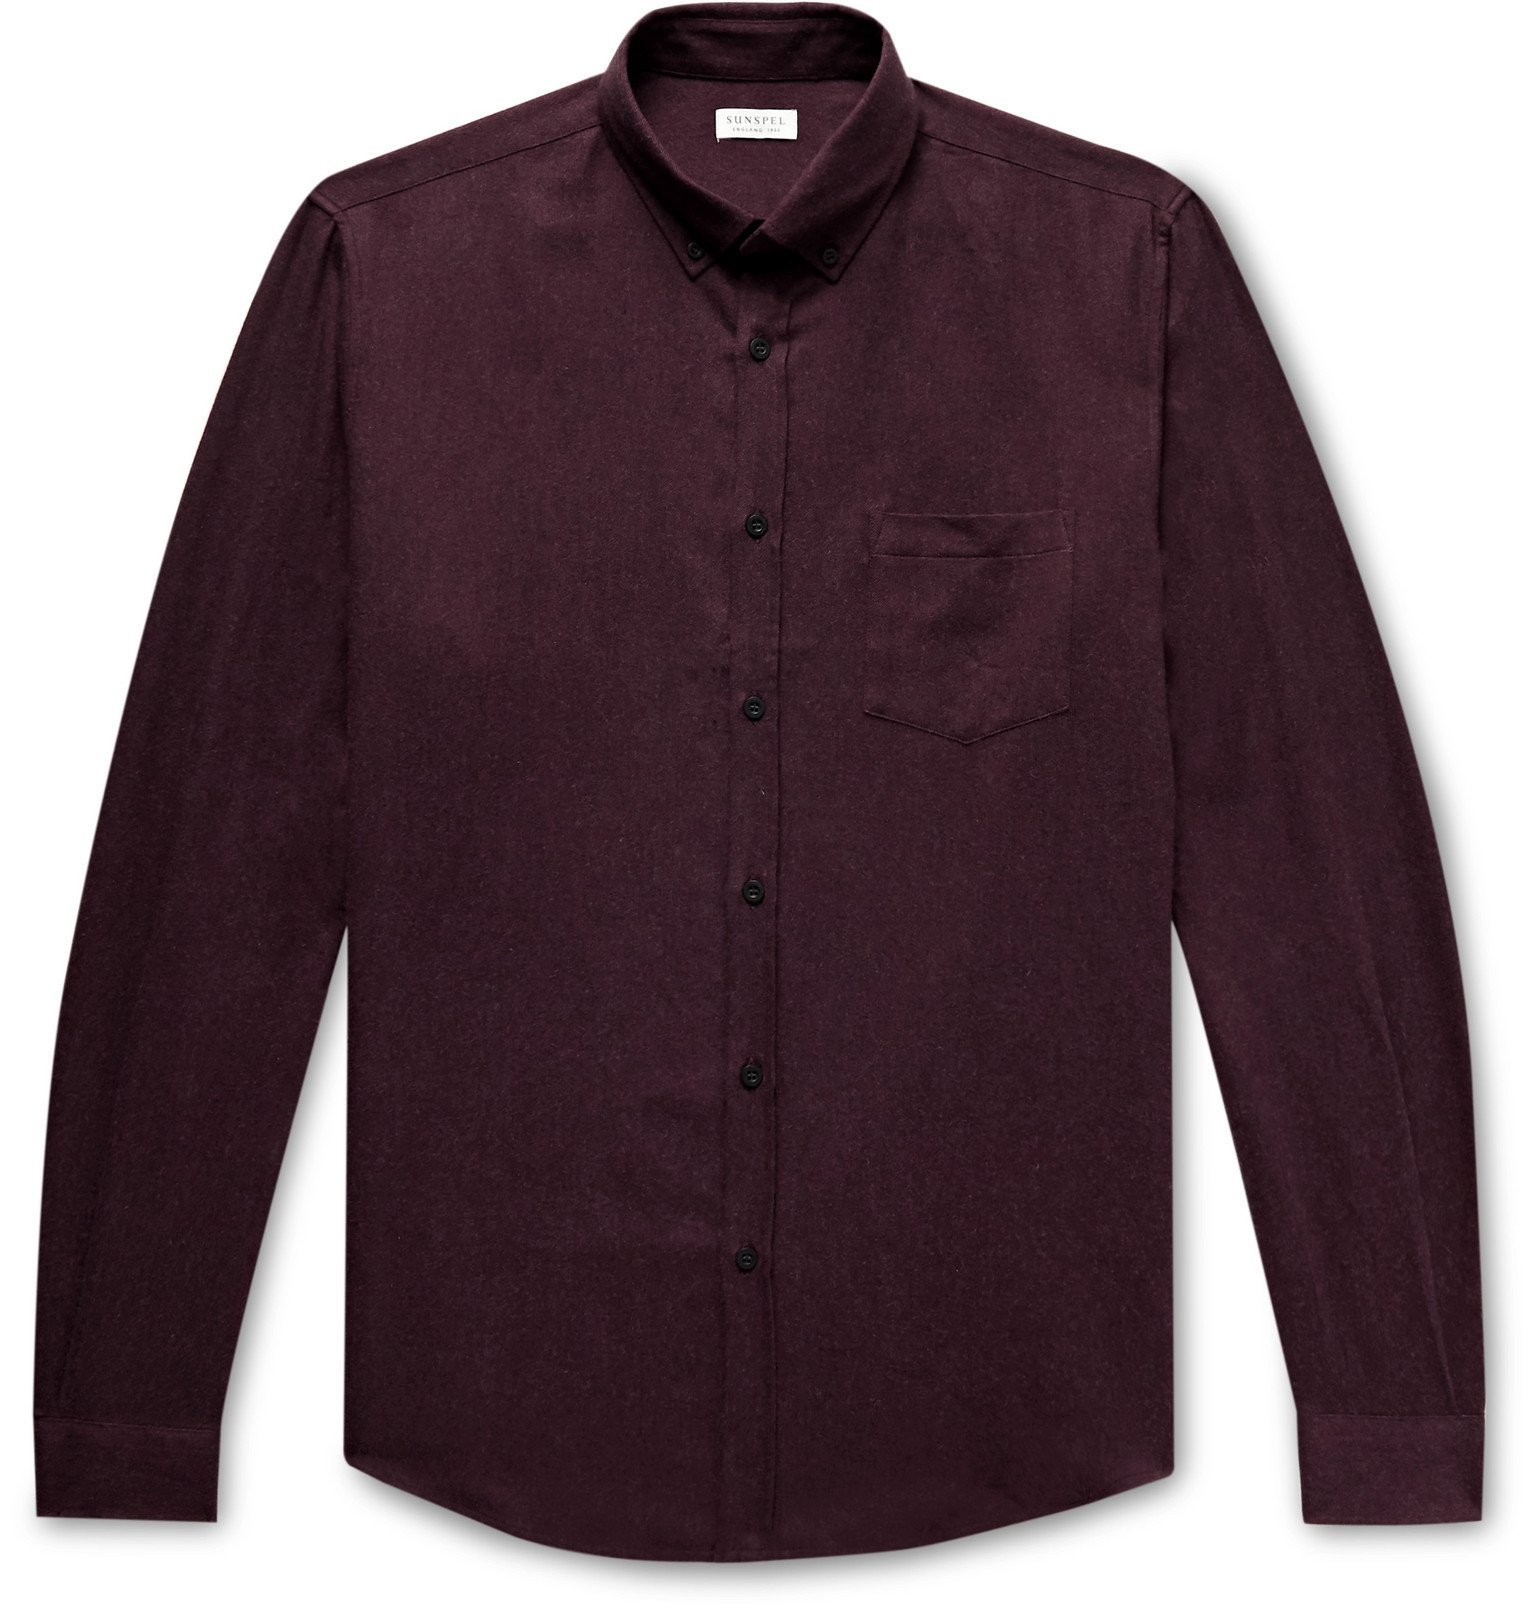 Sunspel - Button-Down Collar Brushed Cotton-Flannel Shirt - Burgundy